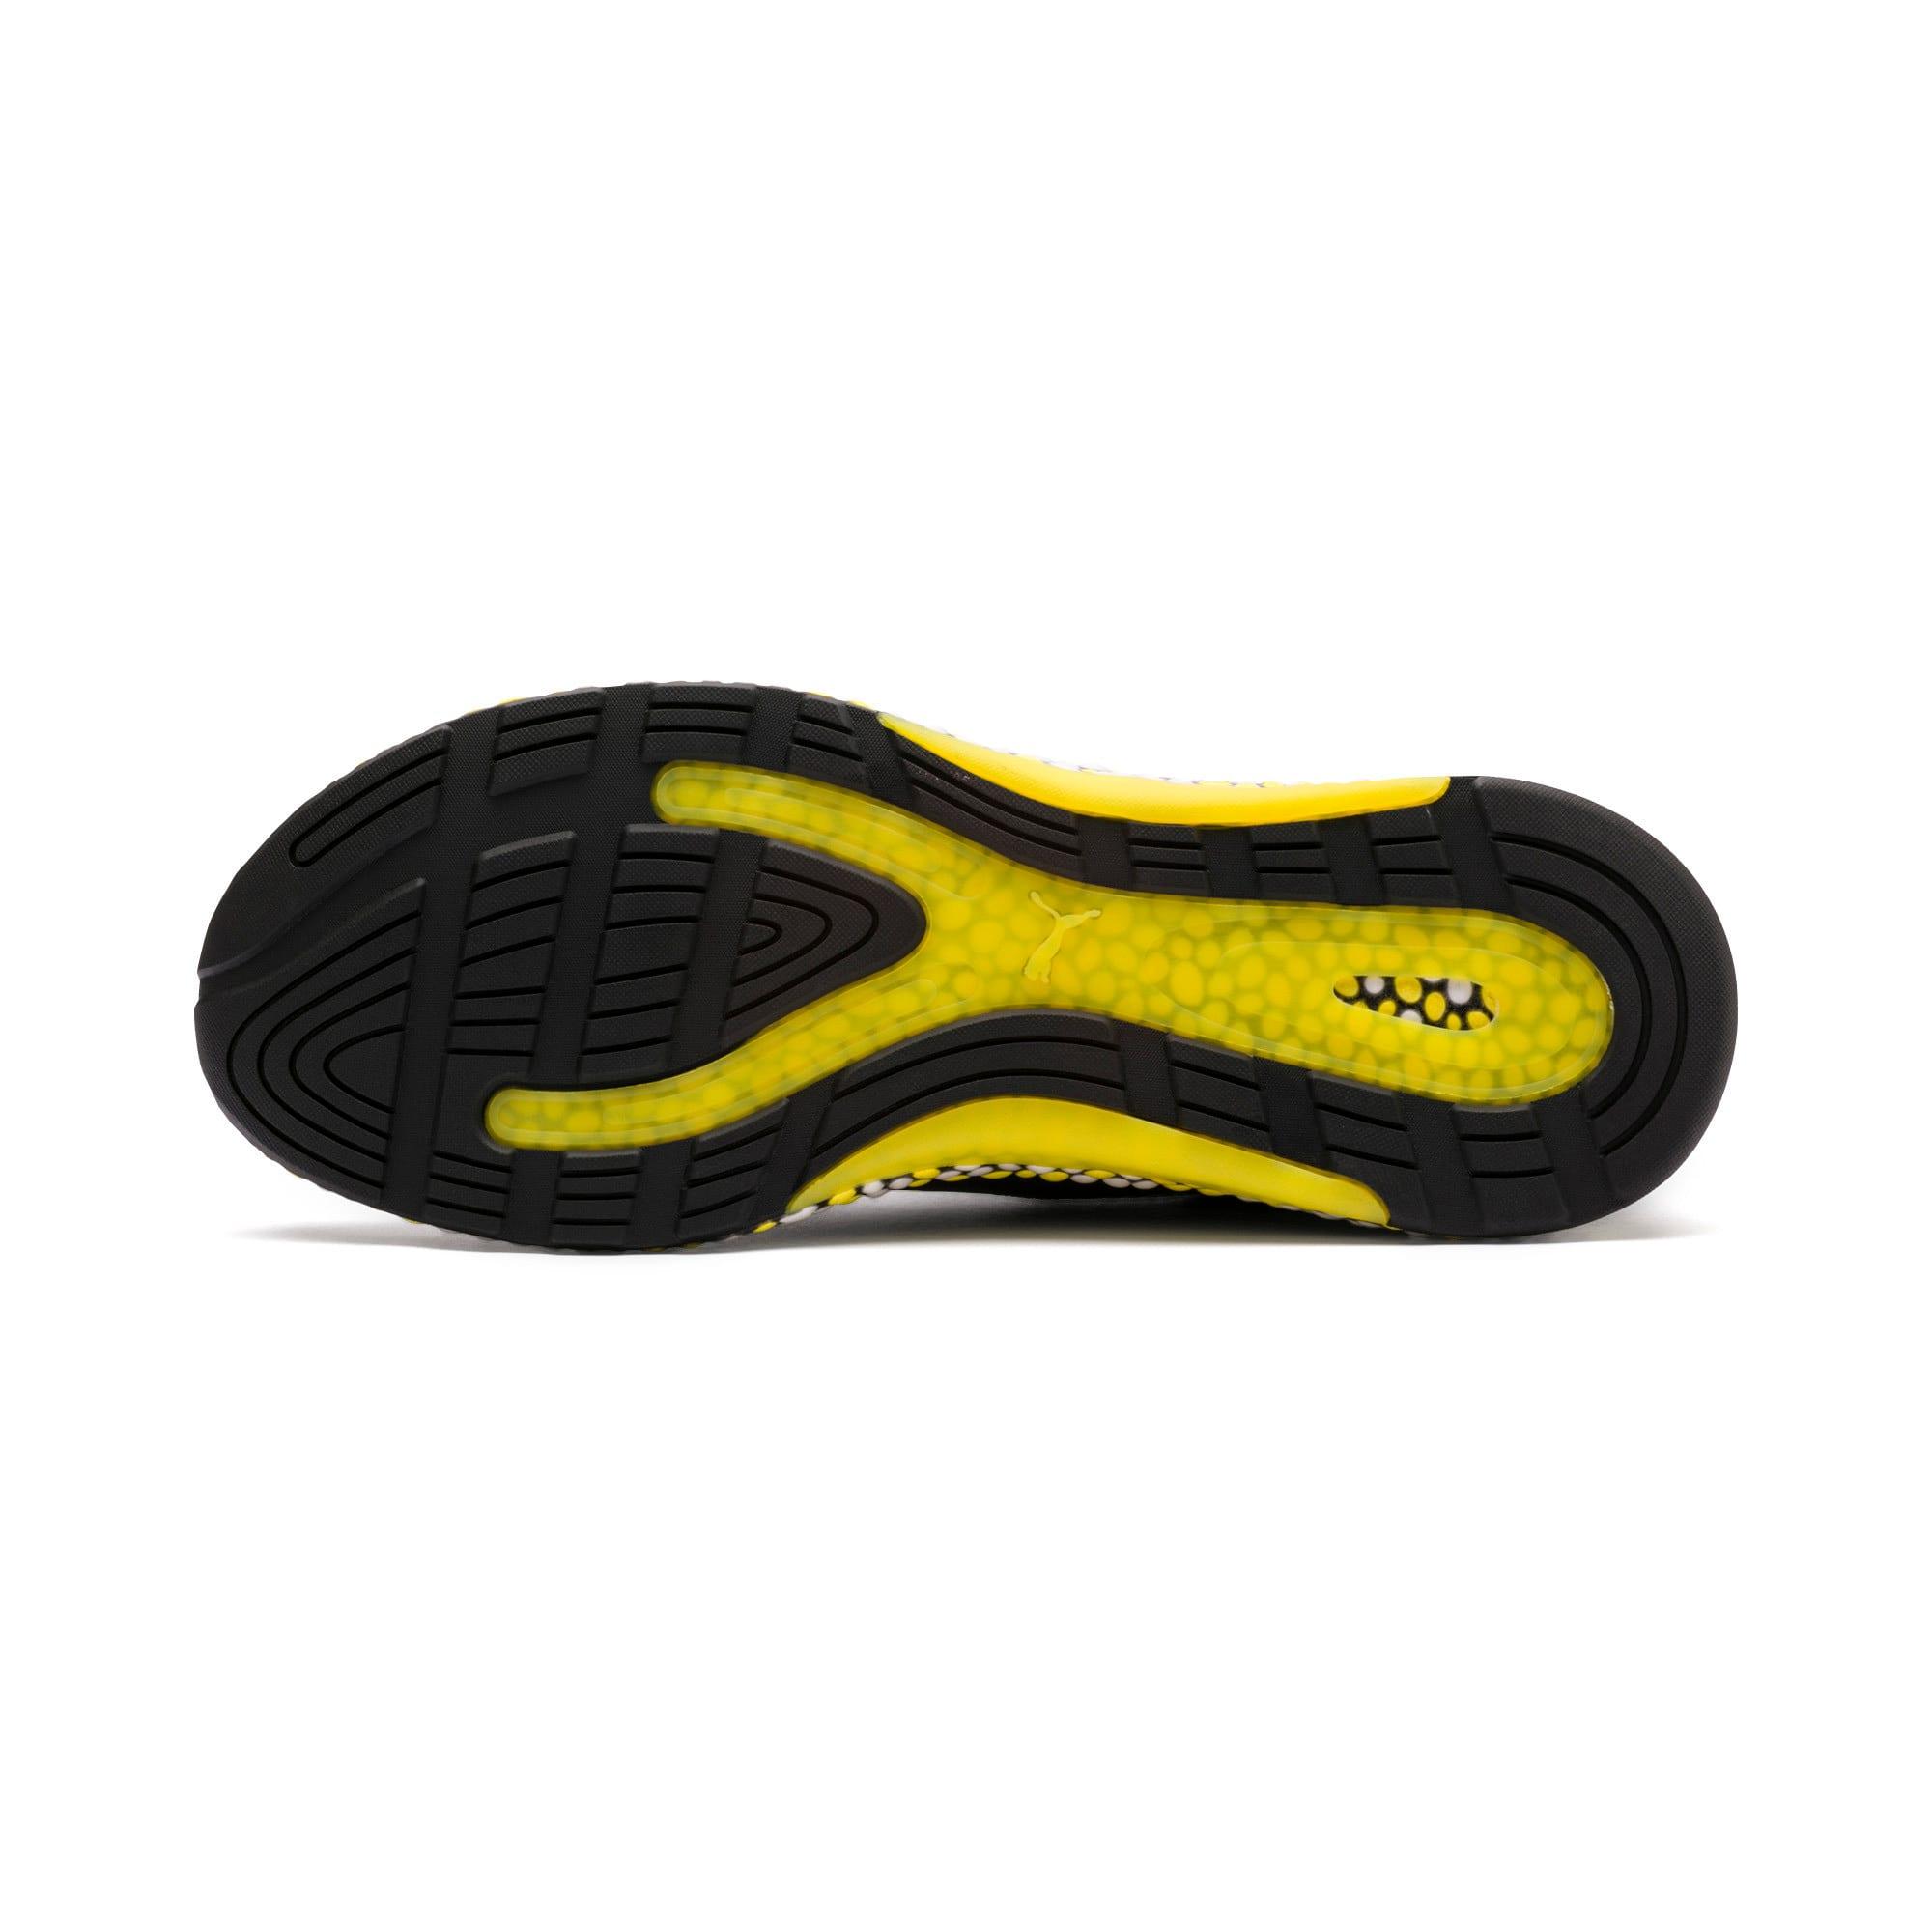 Thumbnail 4 of Hybrid Runner hardloopschoenen voor heren, Black-White-Blazing Yellow, medium